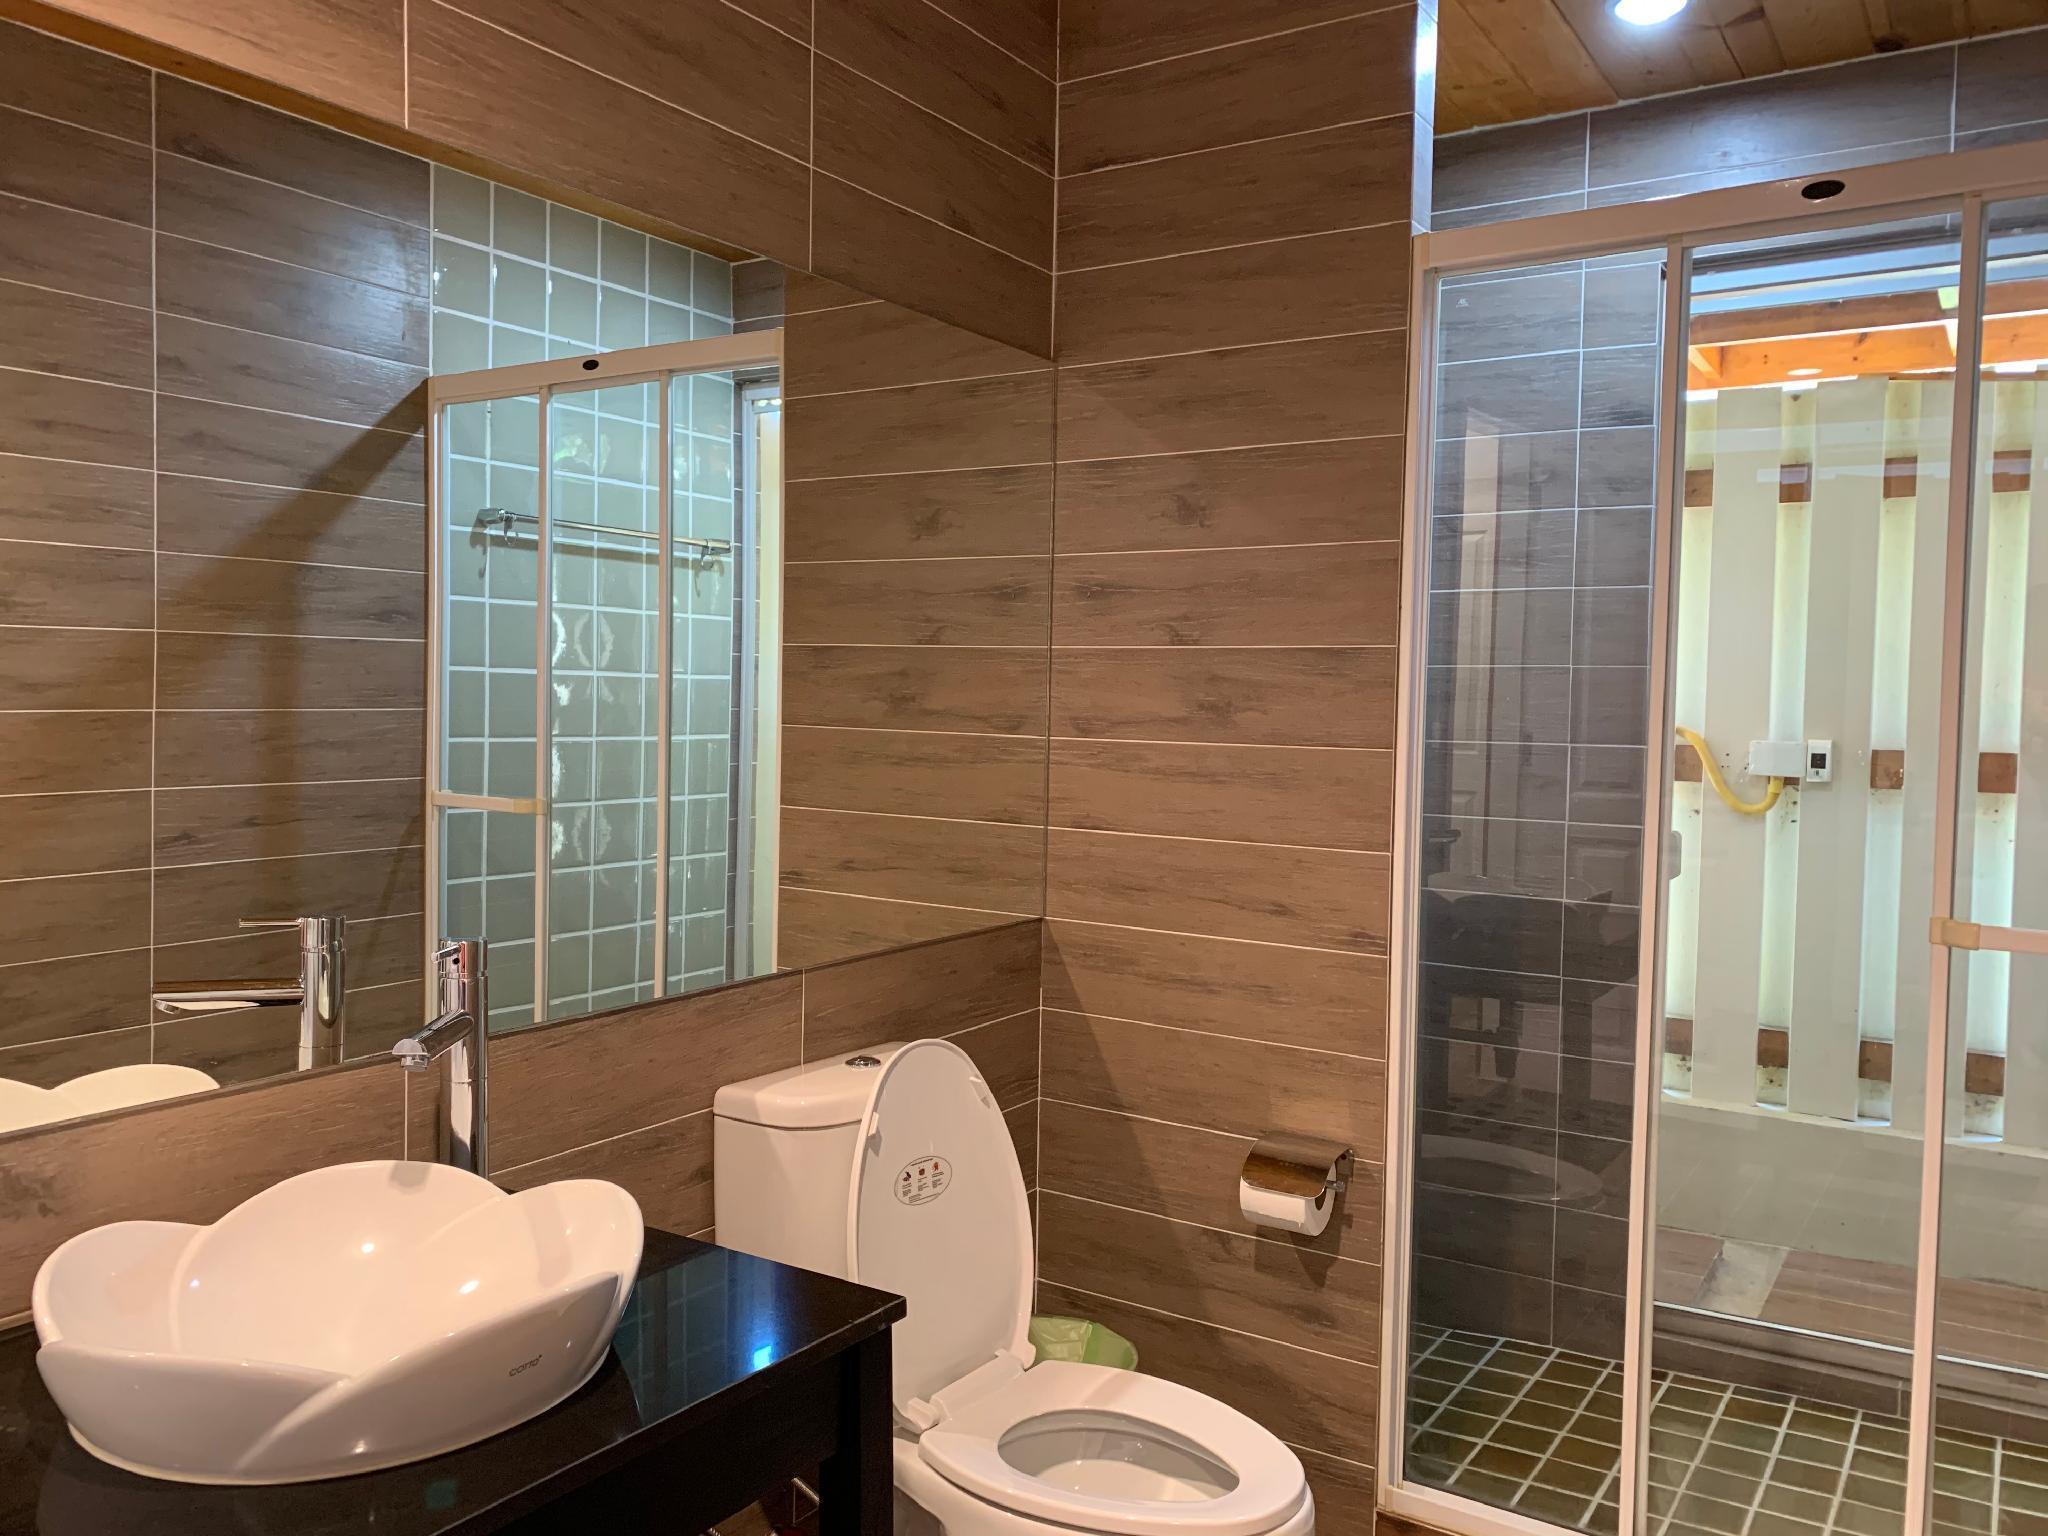 3BR New Log Home@Khao Yai National Park by TripleB วิลลา 3 ห้องนอน 3 ห้องน้ำส่วนตัว ขนาด 234 ตร.ม. – อุทยานแห่งชาติเขาใหญ่